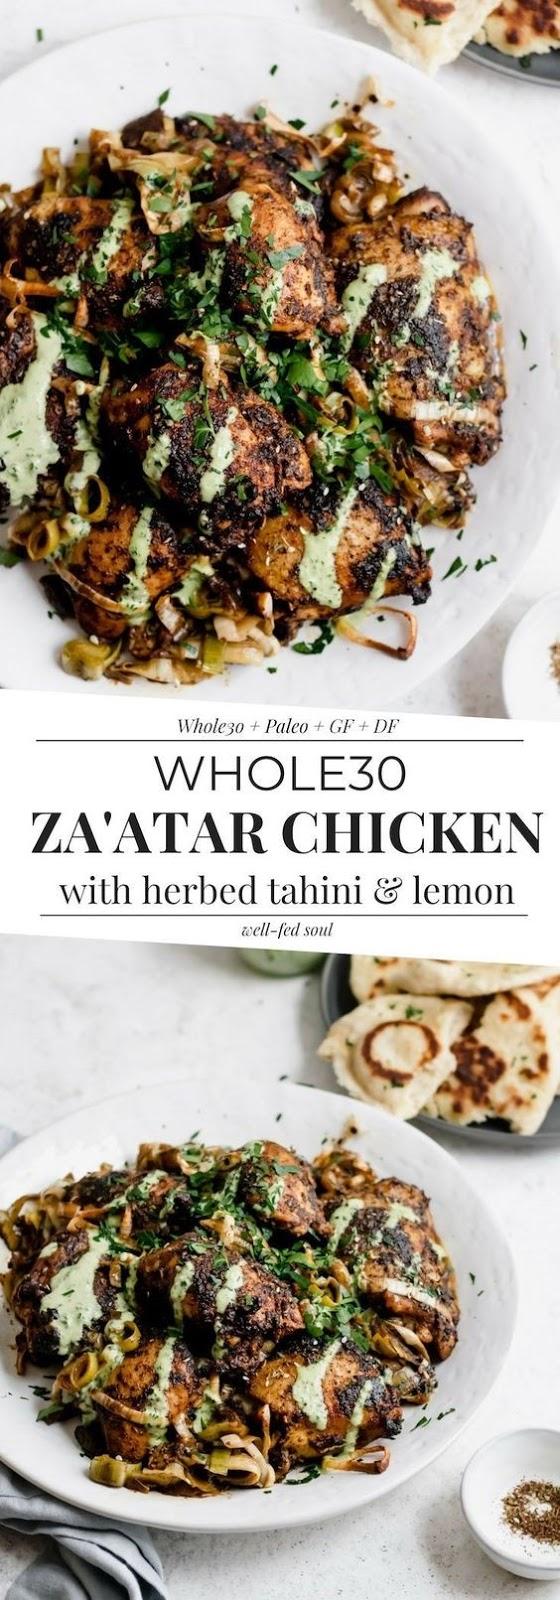 Weeknight Roasted Za'atar Chicken with Herbed Tahini & Leeks